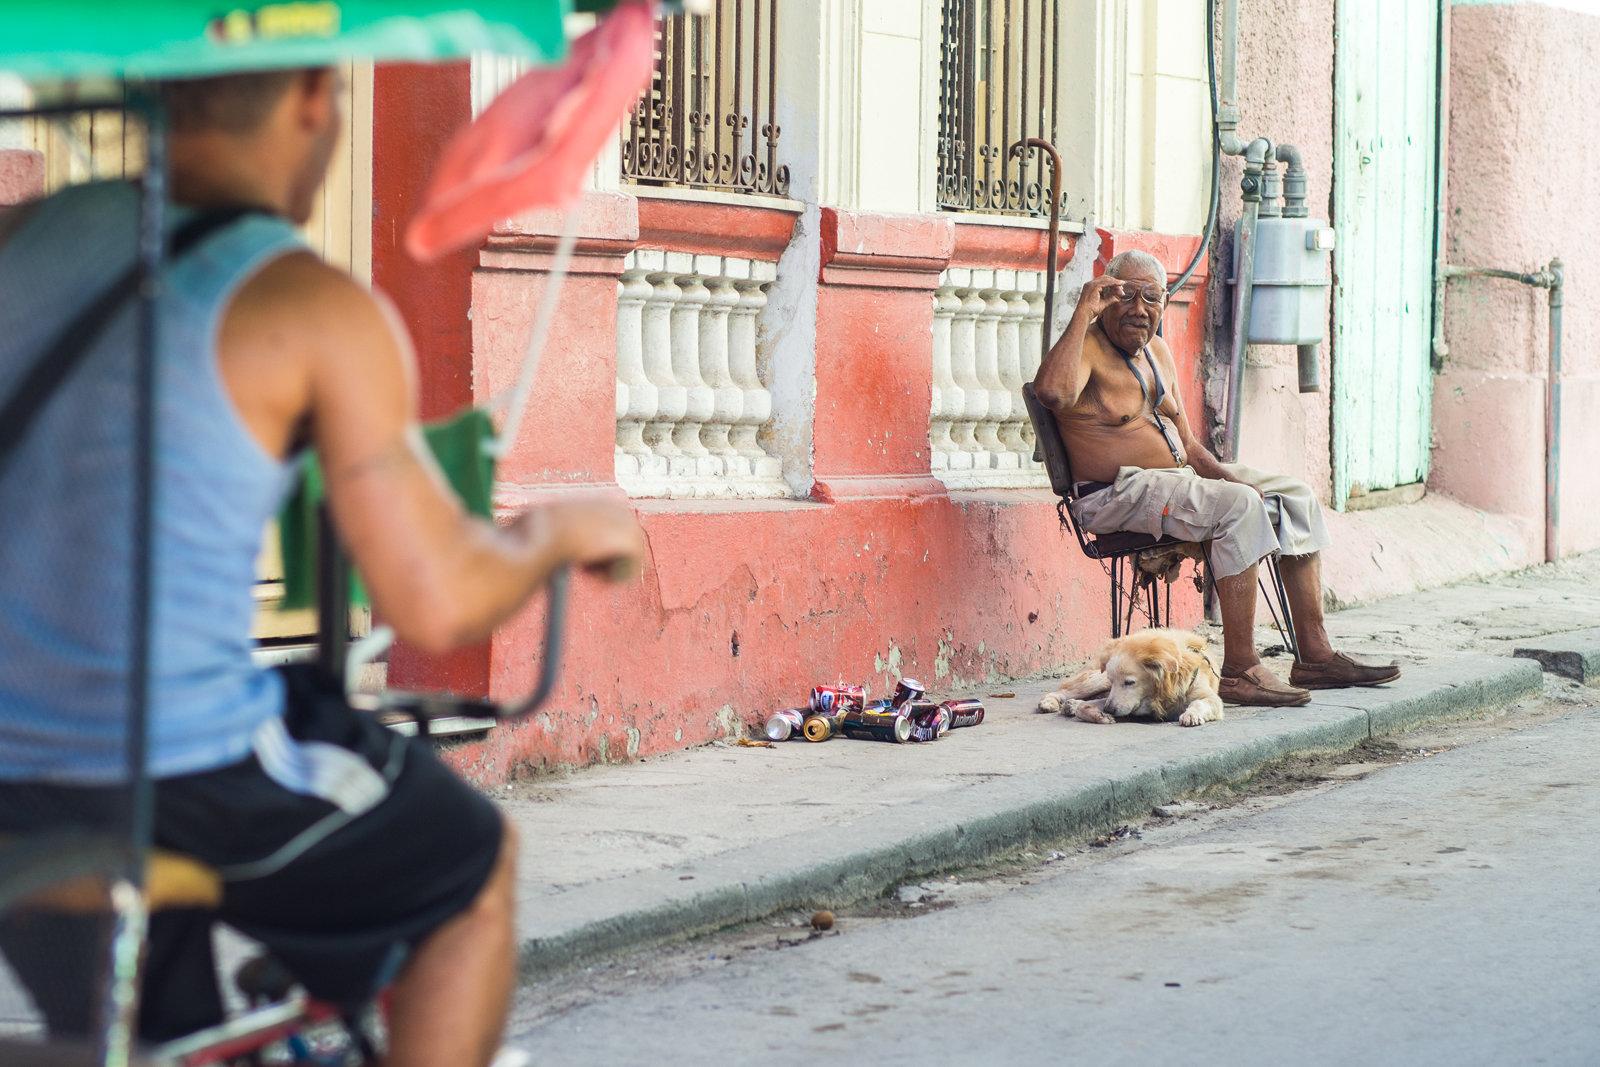 04_Cuba_2014_Erik_Hart_Lensculture_1600px.jpg